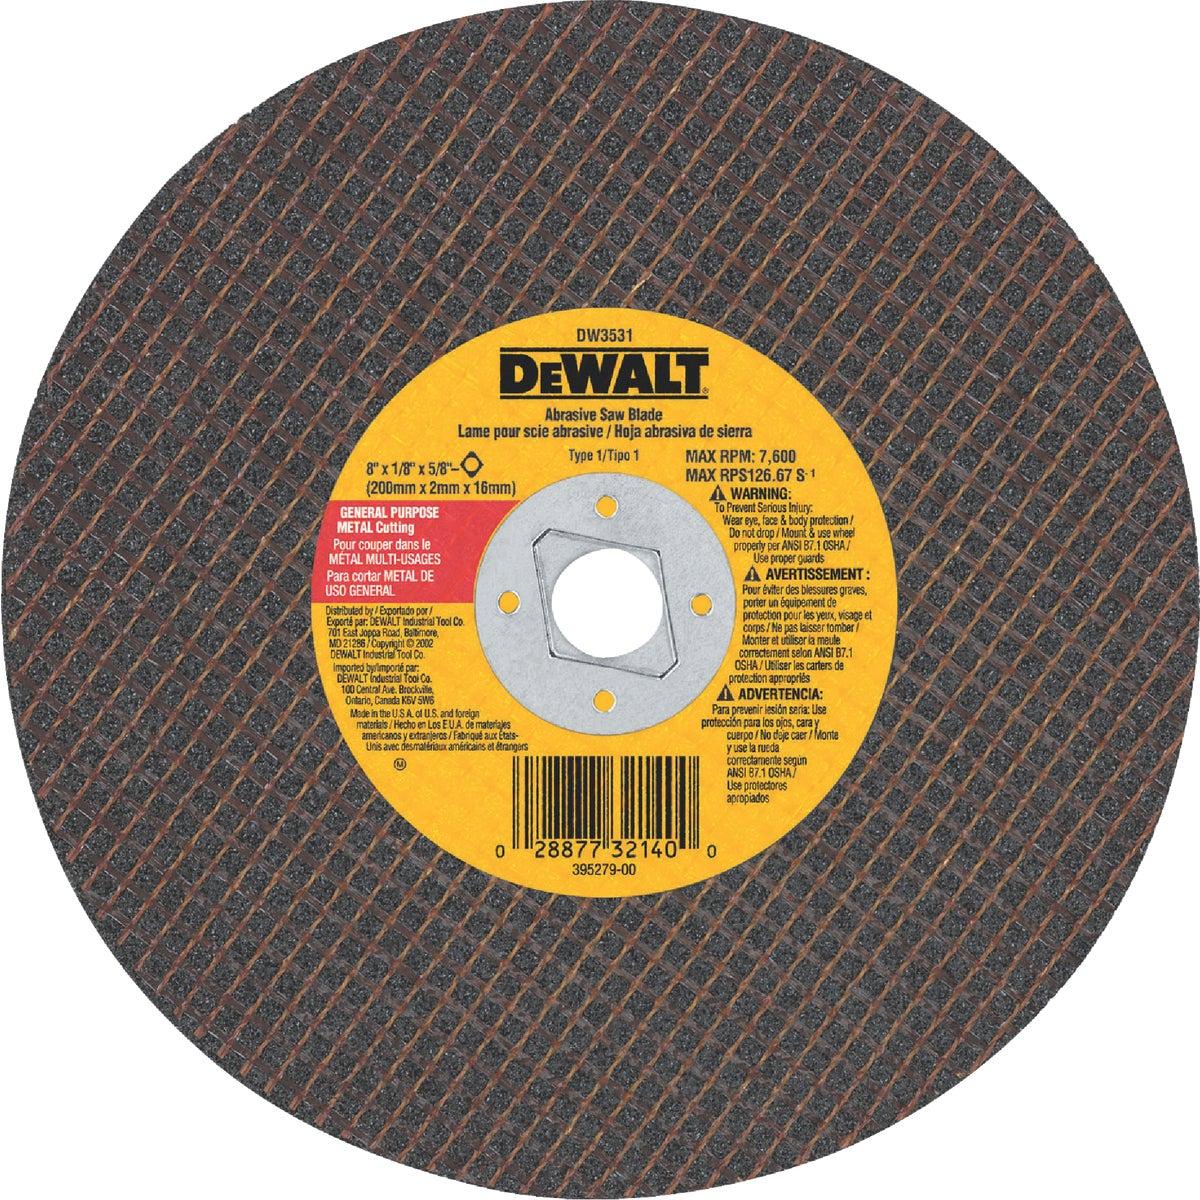 "8"" METAL ABRASIVE BLADE - DW3531 by DeWalt"